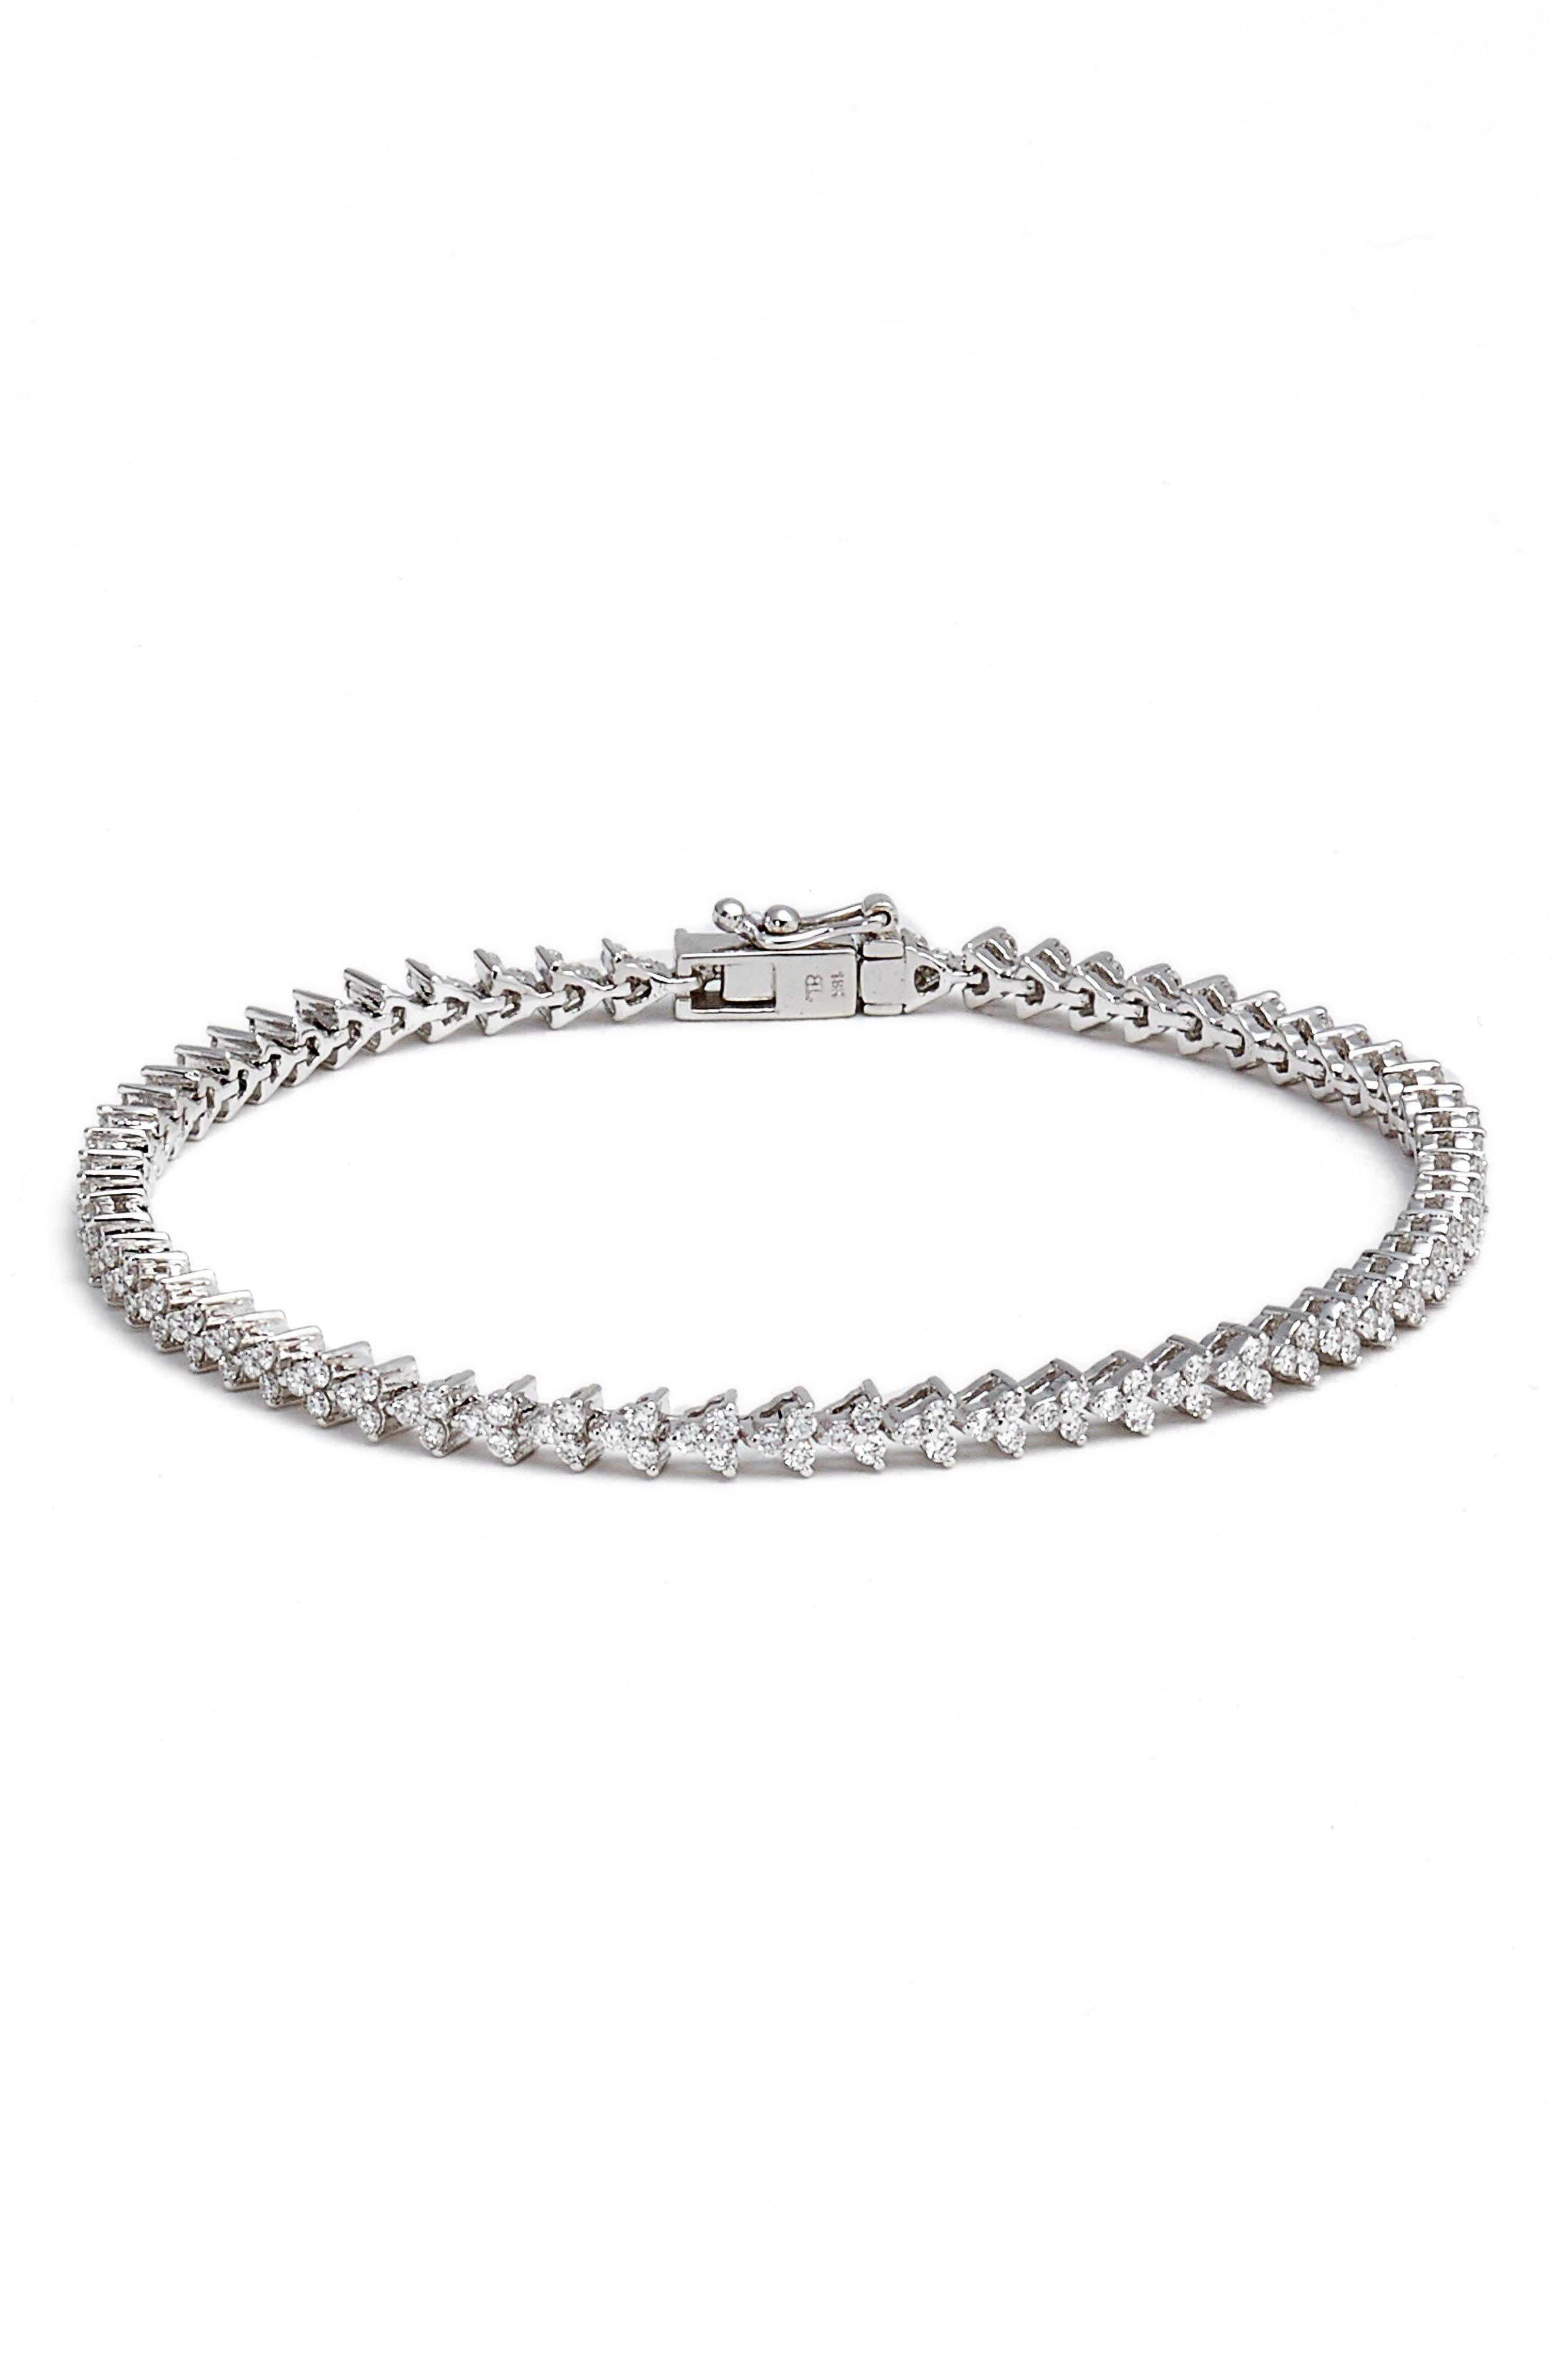 Liora Diamond Tennis Bracelet,                             Main thumbnail 1, color,                             WHITE GOLD